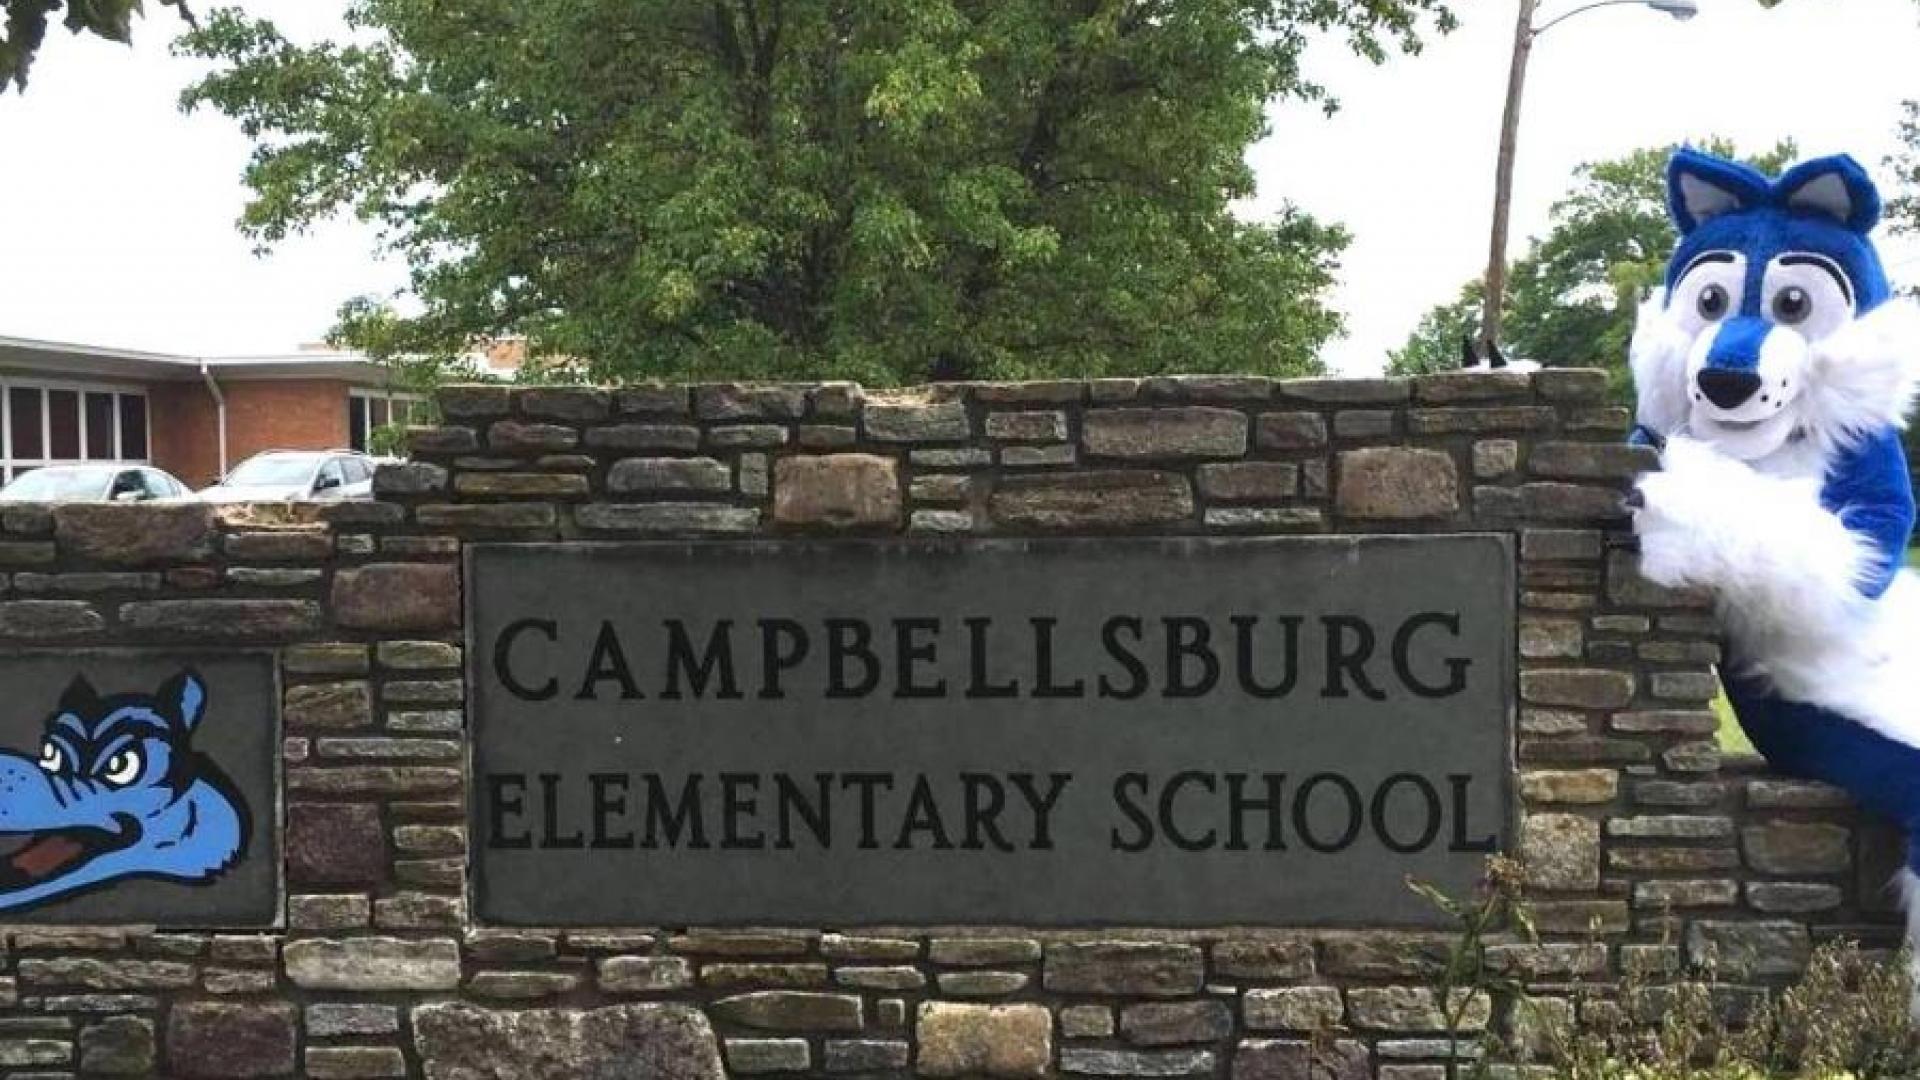 Campellsburg Elementary